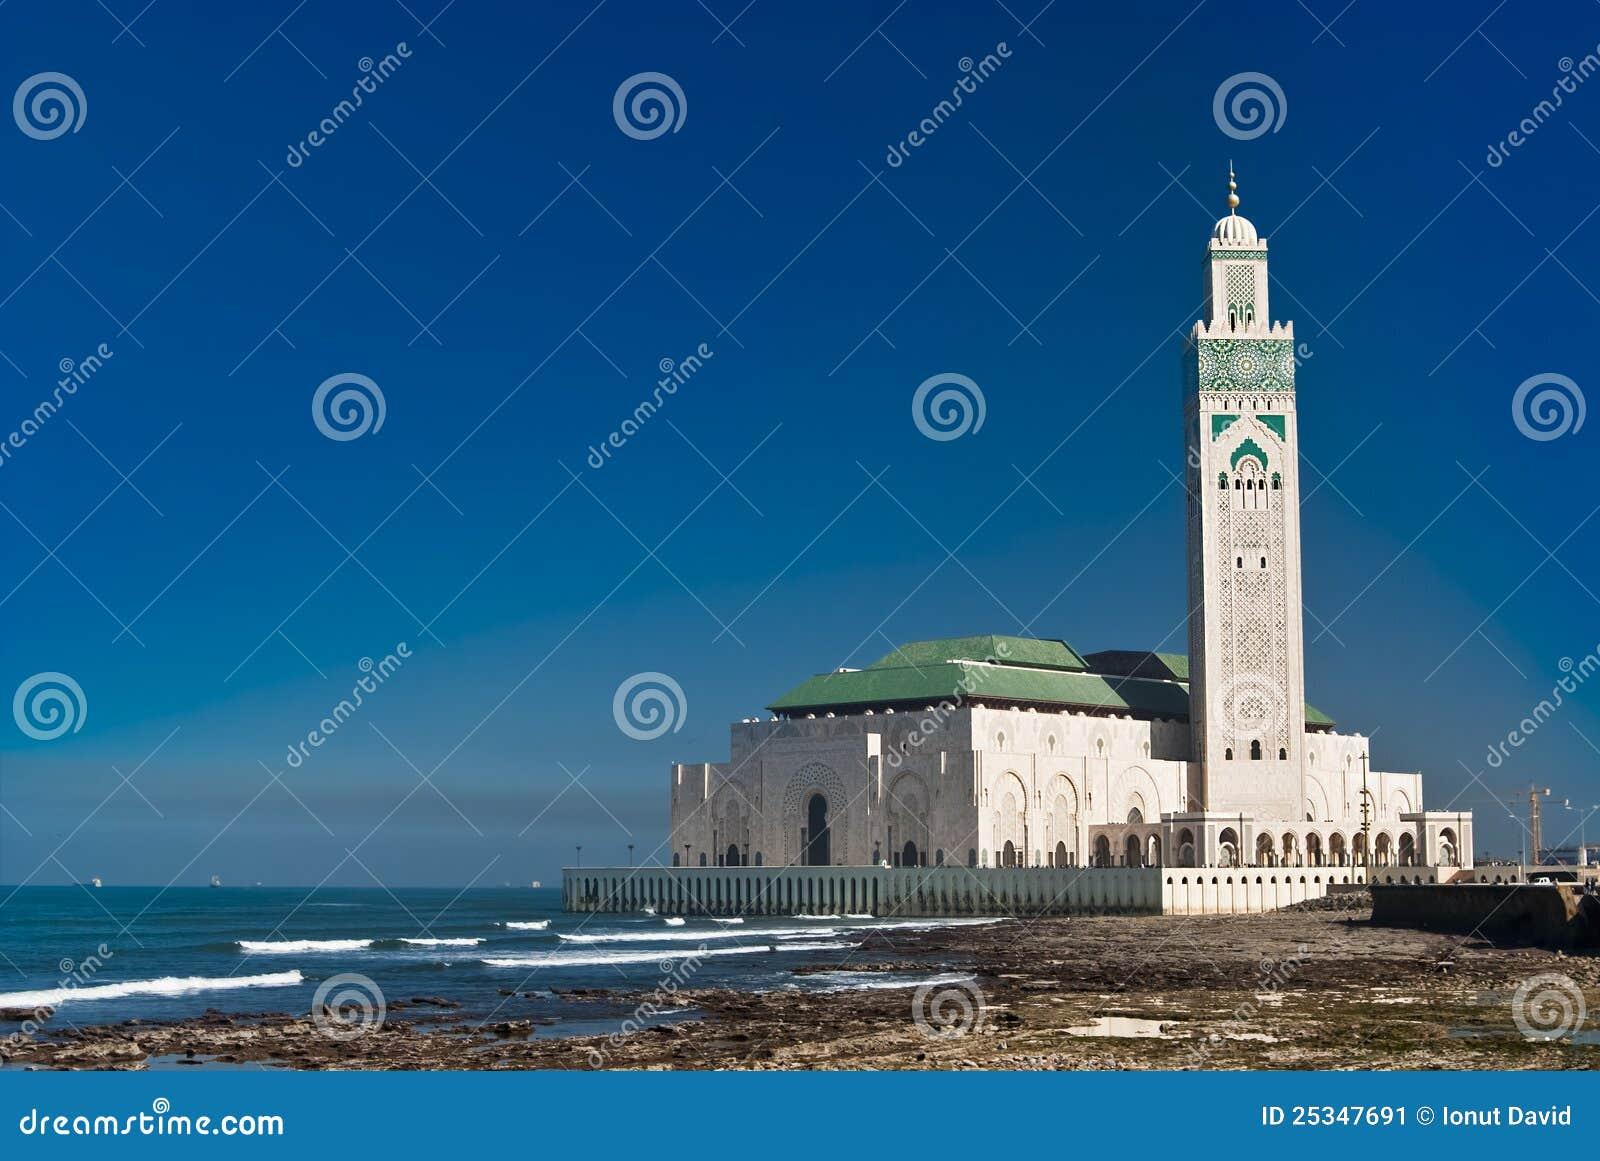 Mosquée du Roi Hassan II, Casablanca, Maroc